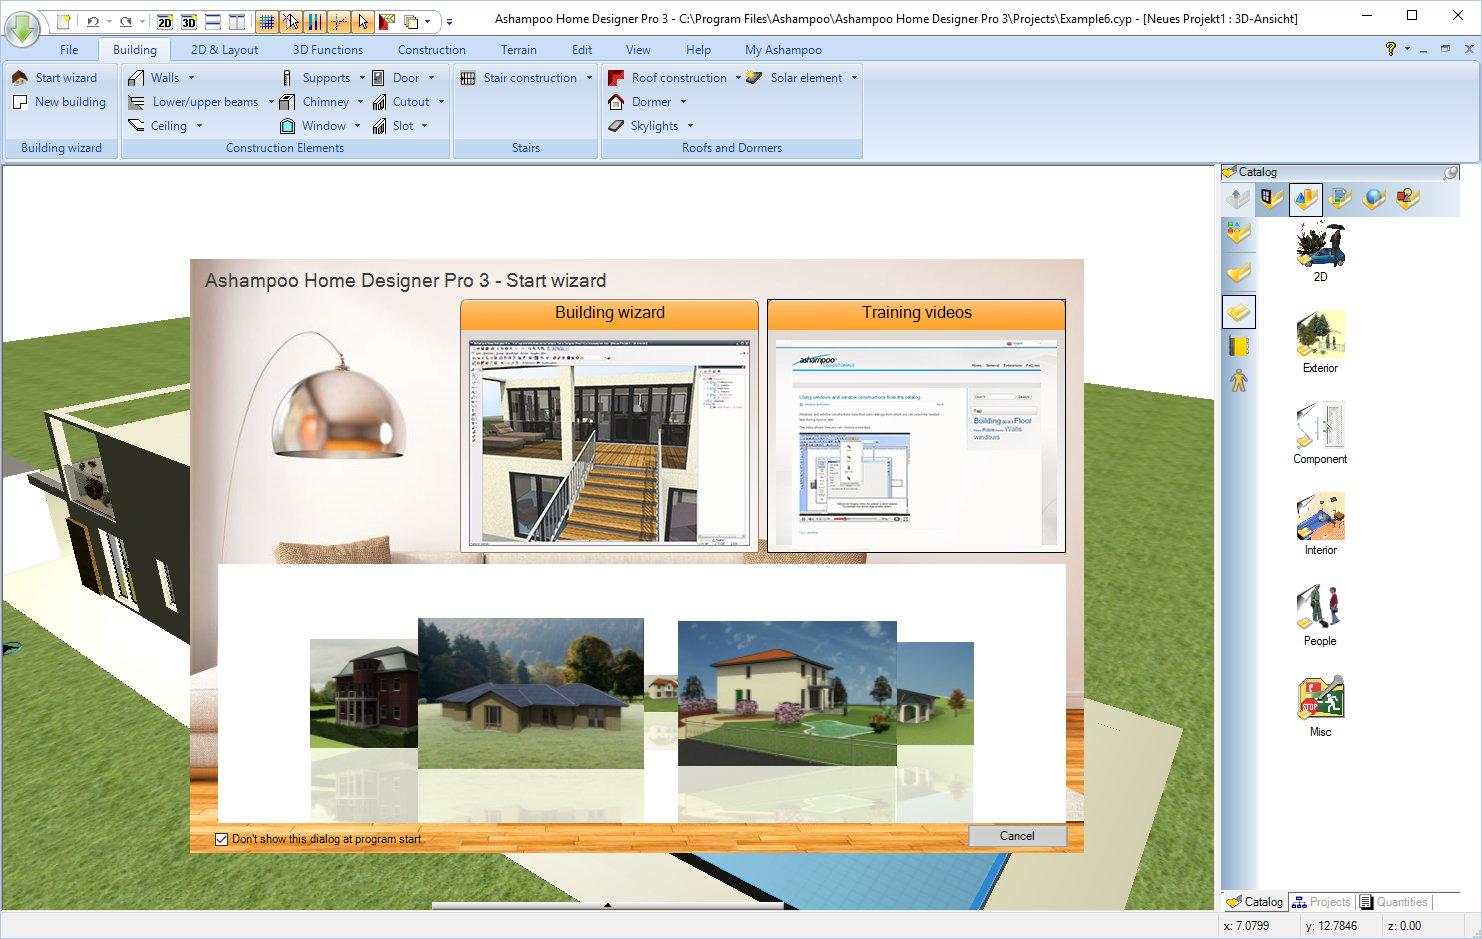 Ashampoo Home Designer Pro  Overview - Home designer pro